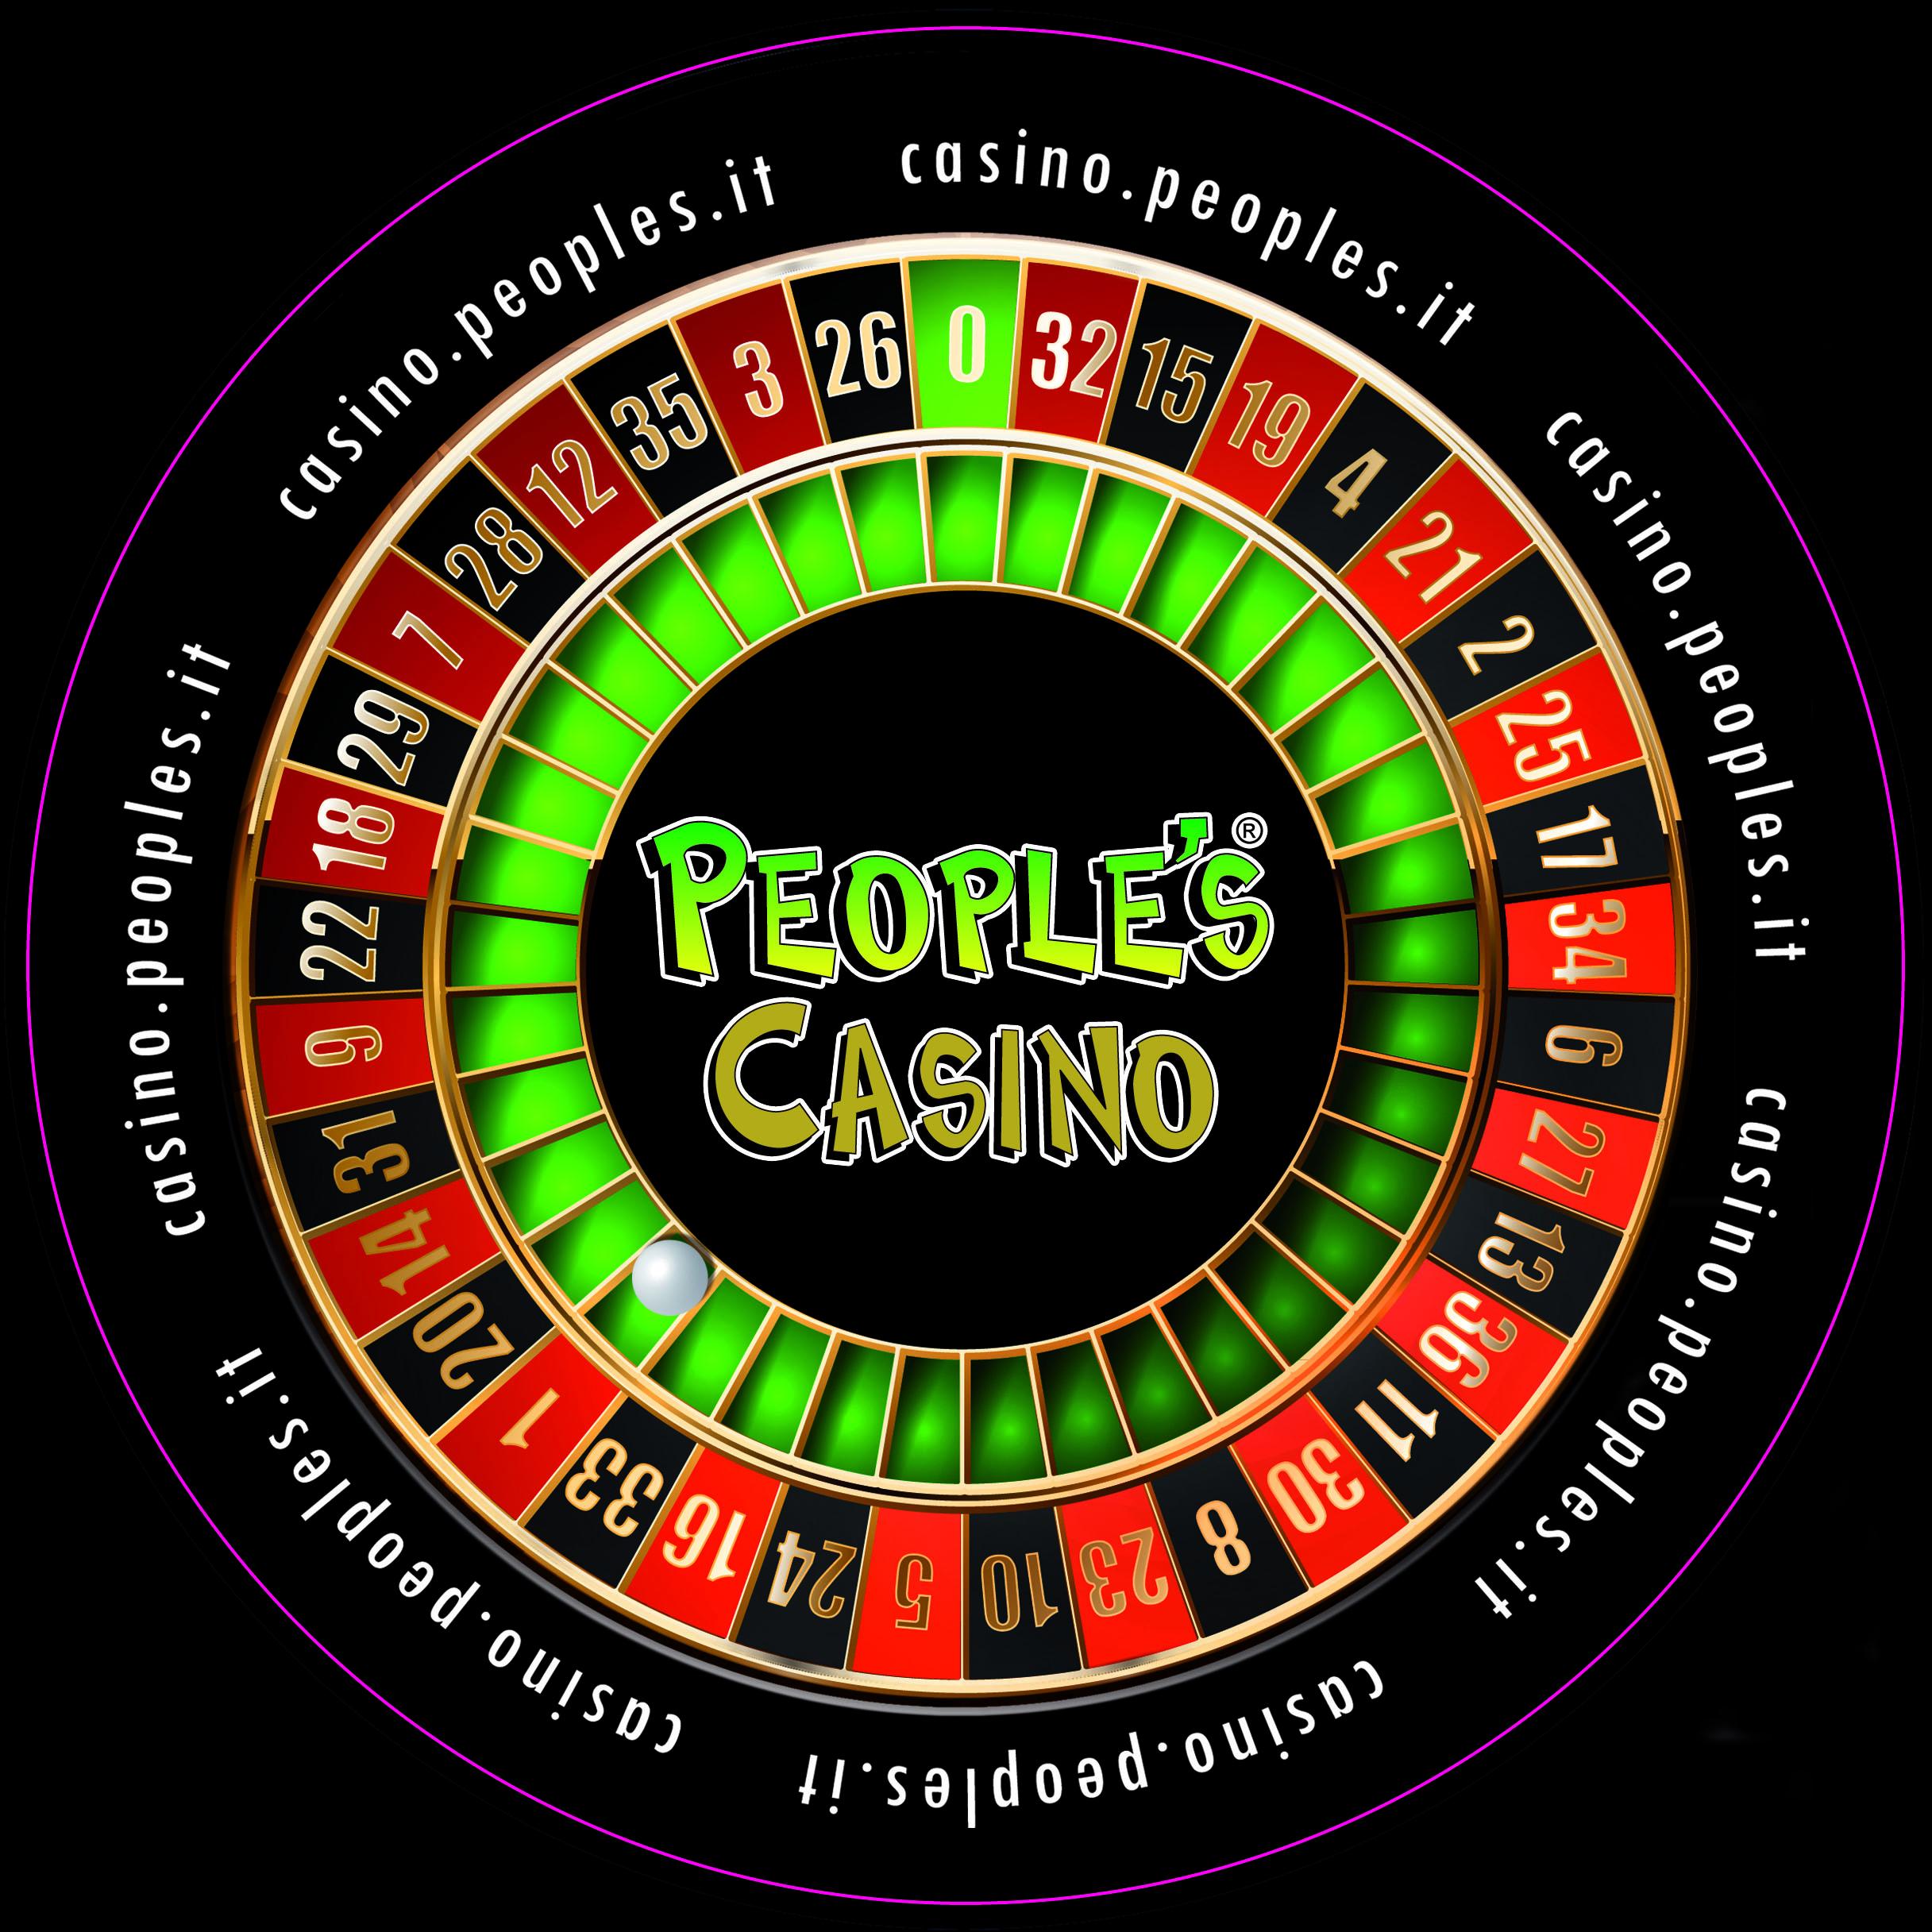 peoplescasino